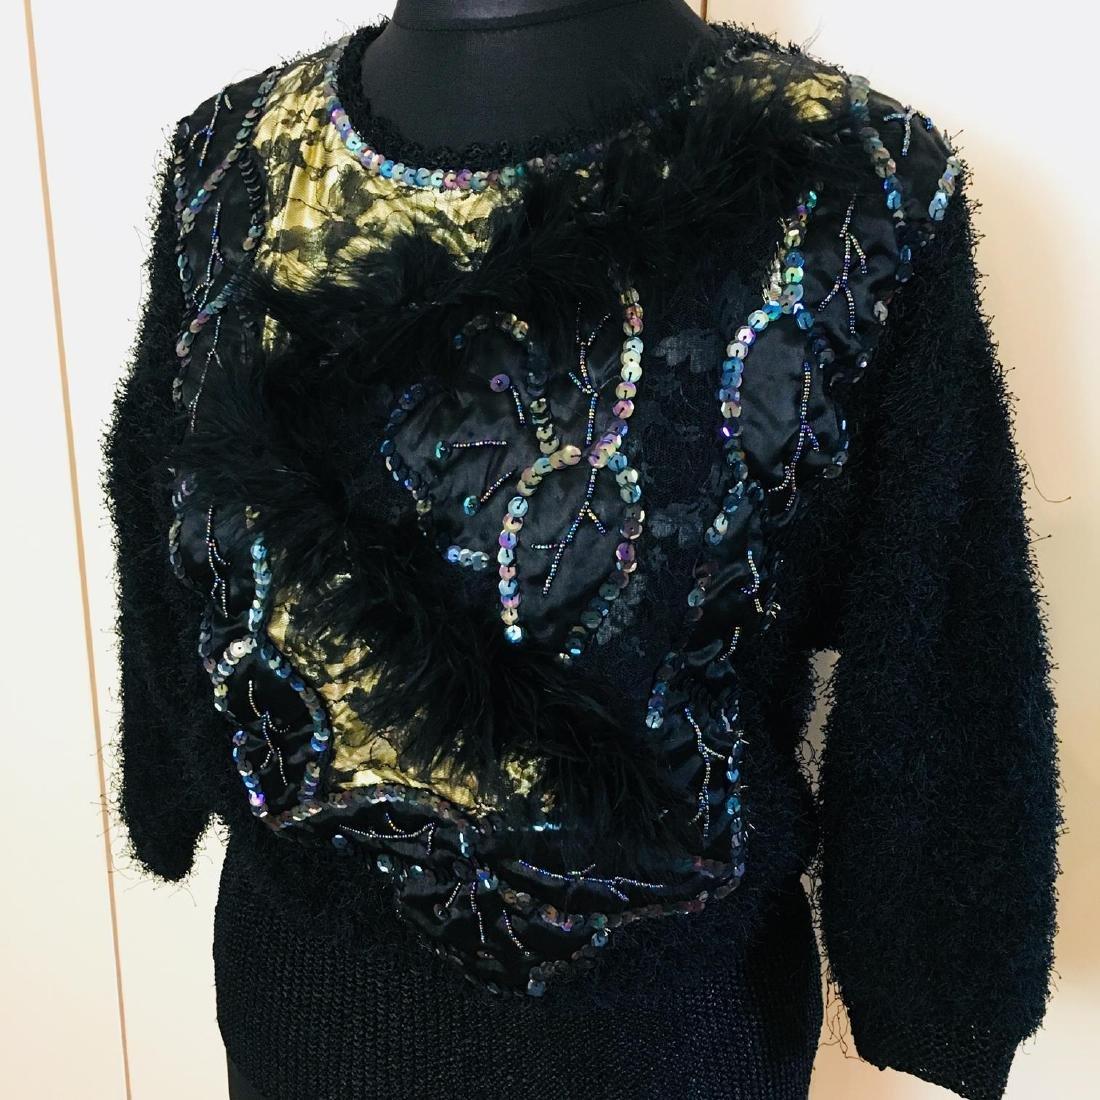 Vintage Women's Fluffy Sweater Jumper Size US 10 - 2